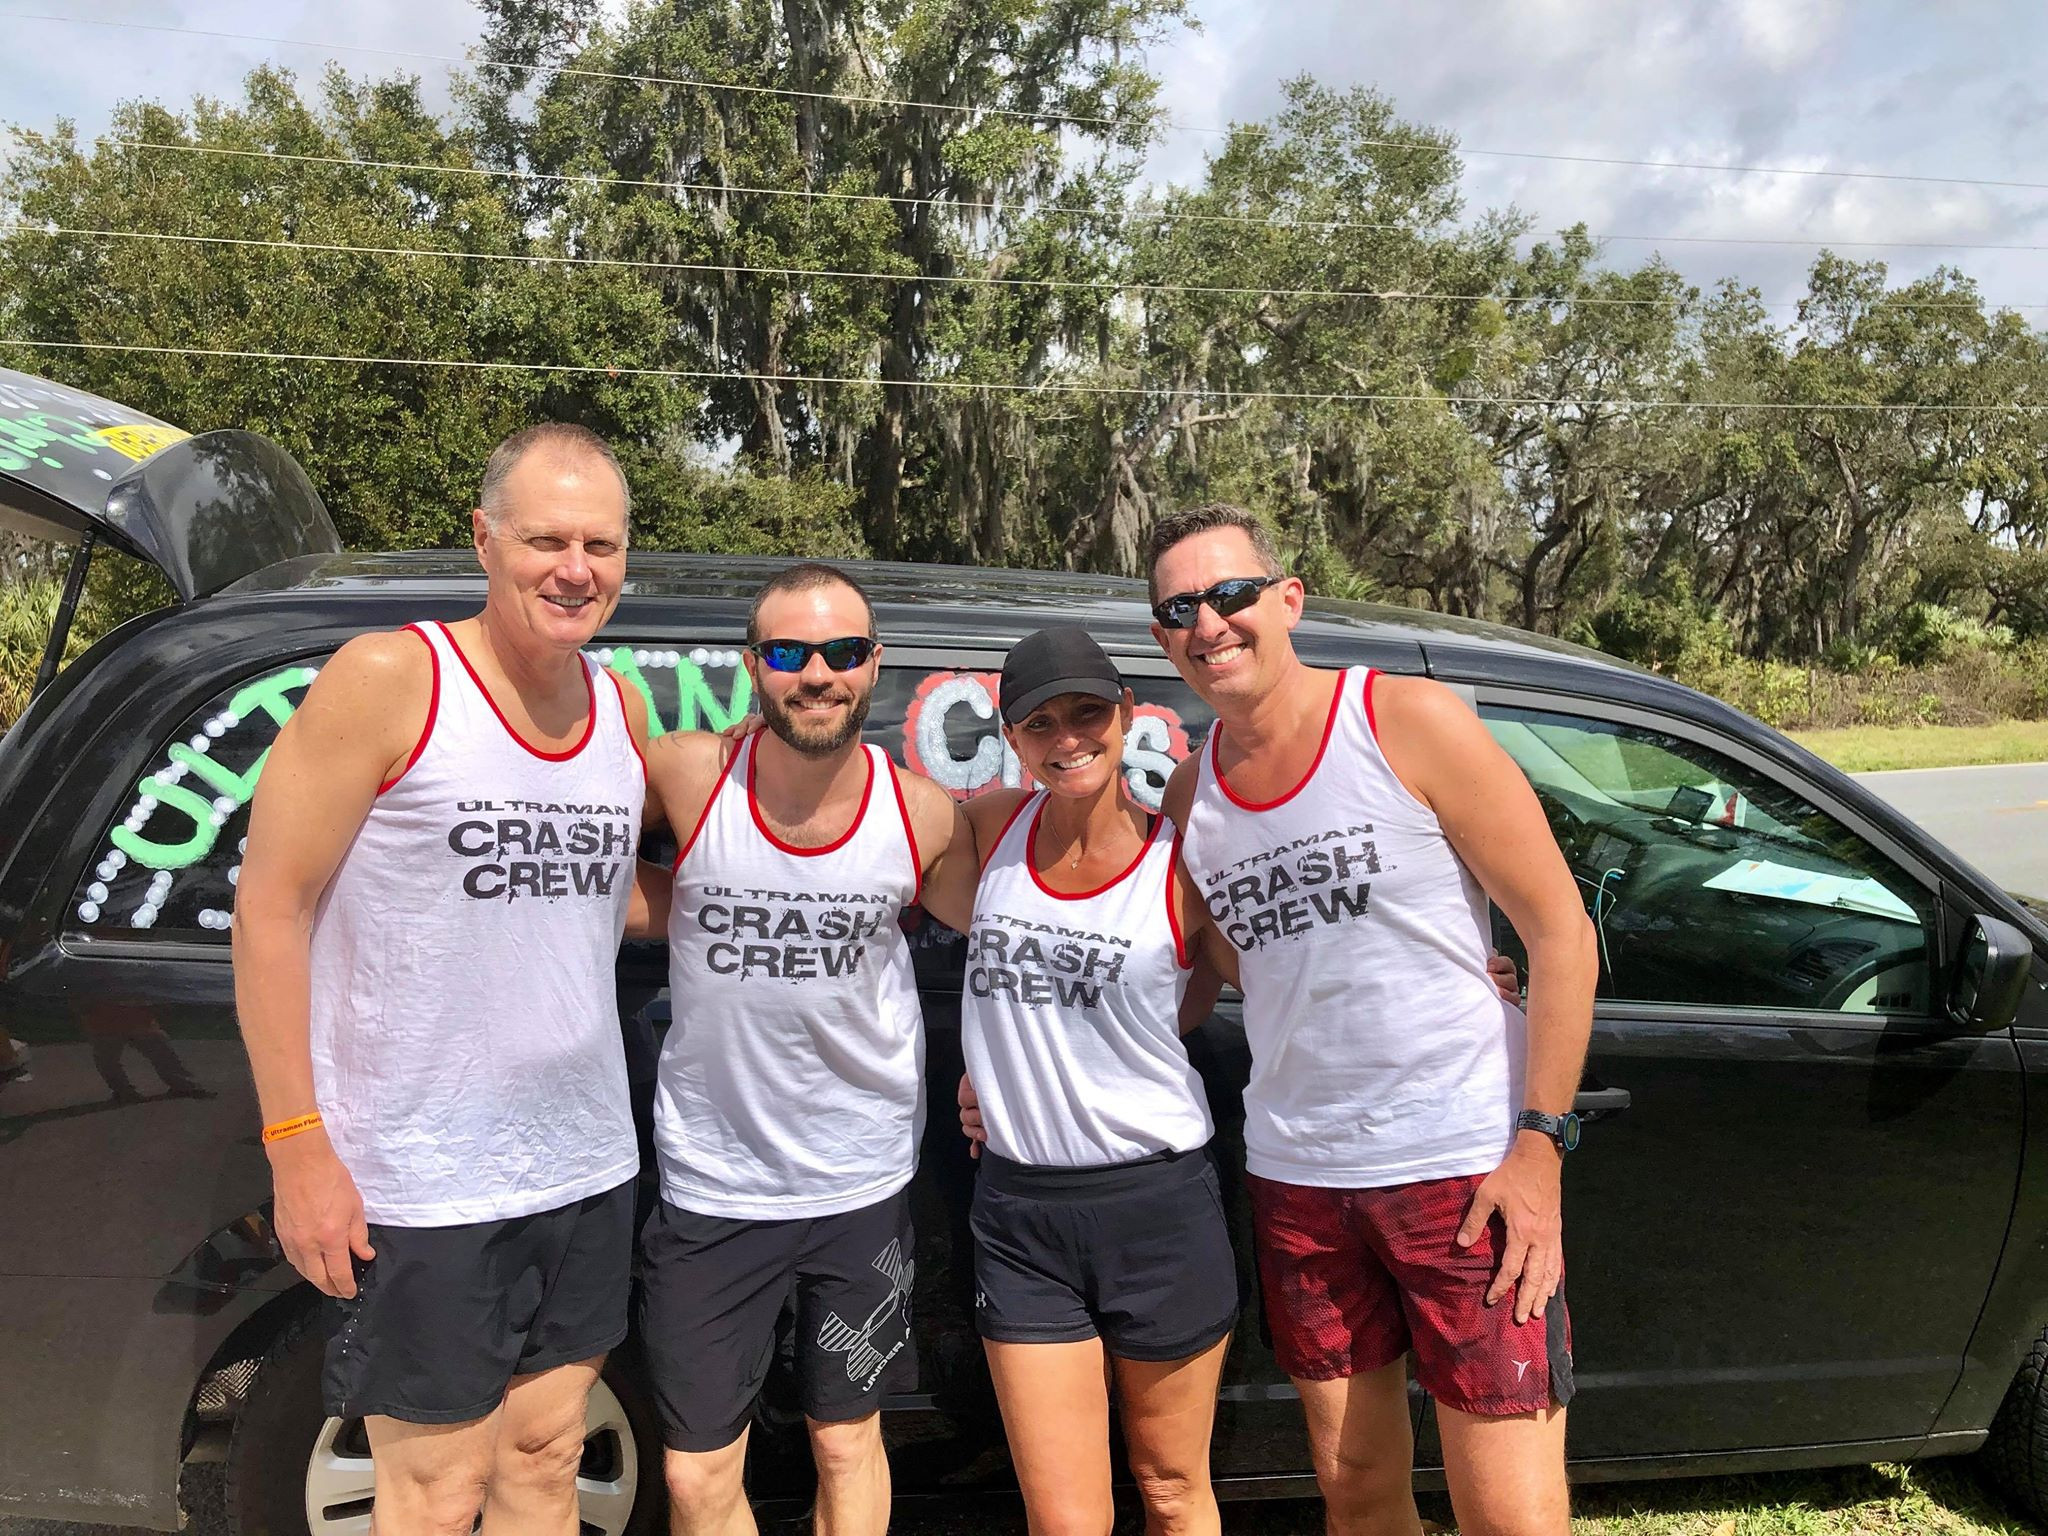 Coach_Terry_Wilson_Pursuit_of_The_Perfect_Race_Ultraman_Florida_Chris_Pollack_17.jpg